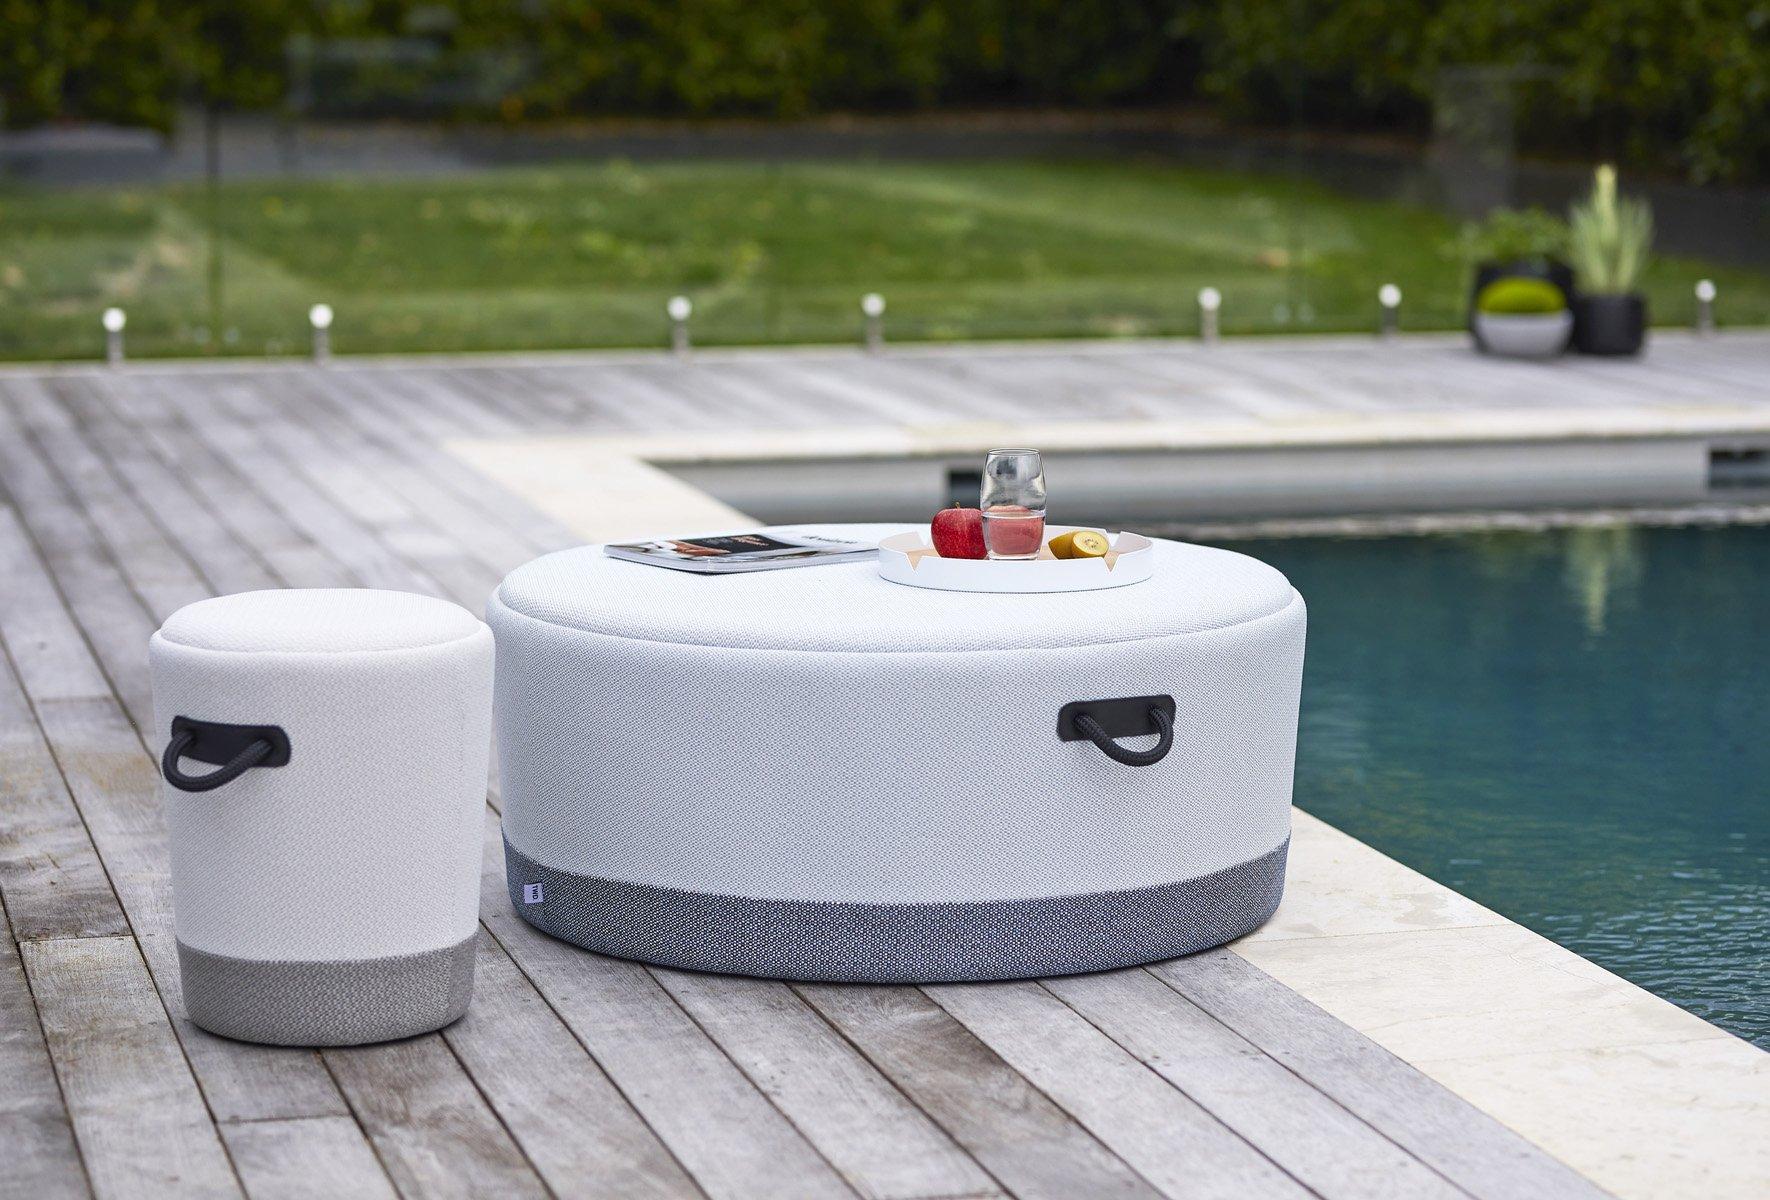 Tim_Webber_Design_-_New_Zealand_Outdoor_Furniture_-_Duffel_Stool_Ottoman_-_1_8f832810-5242-4f45-95ce-ab464b8129c5